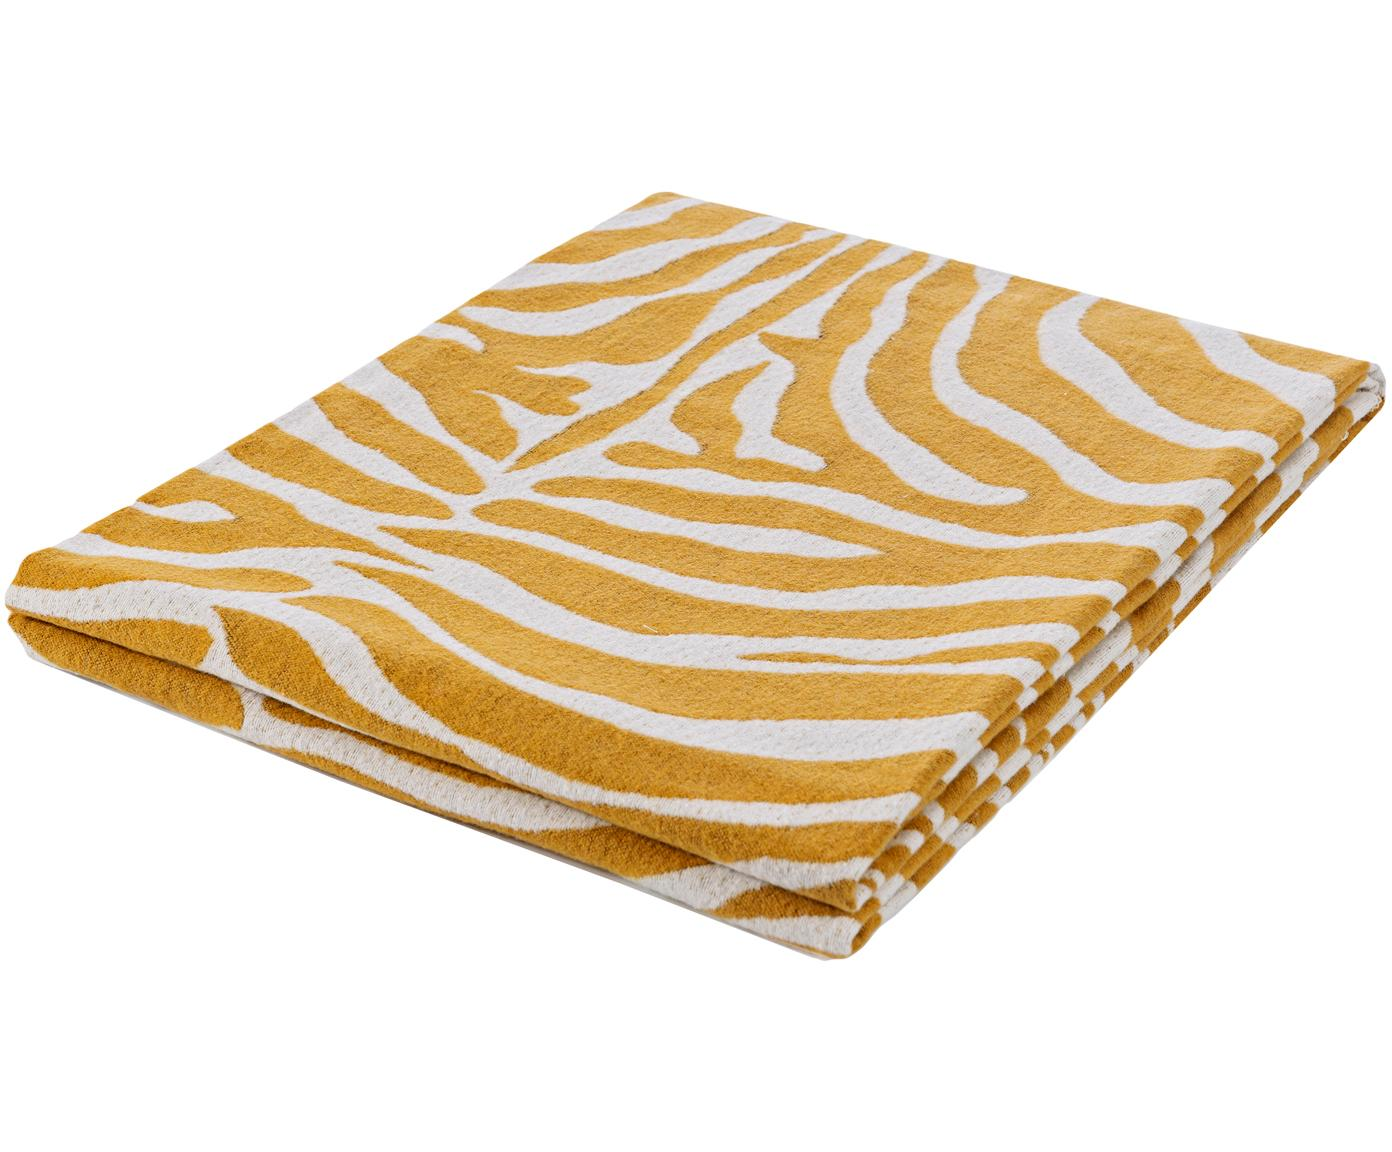 Plaid Sana mit Zebra Print in Gelb/Weiß, Webart: Jacquard, Senfgelb, Weiß, 140 x 180 cm